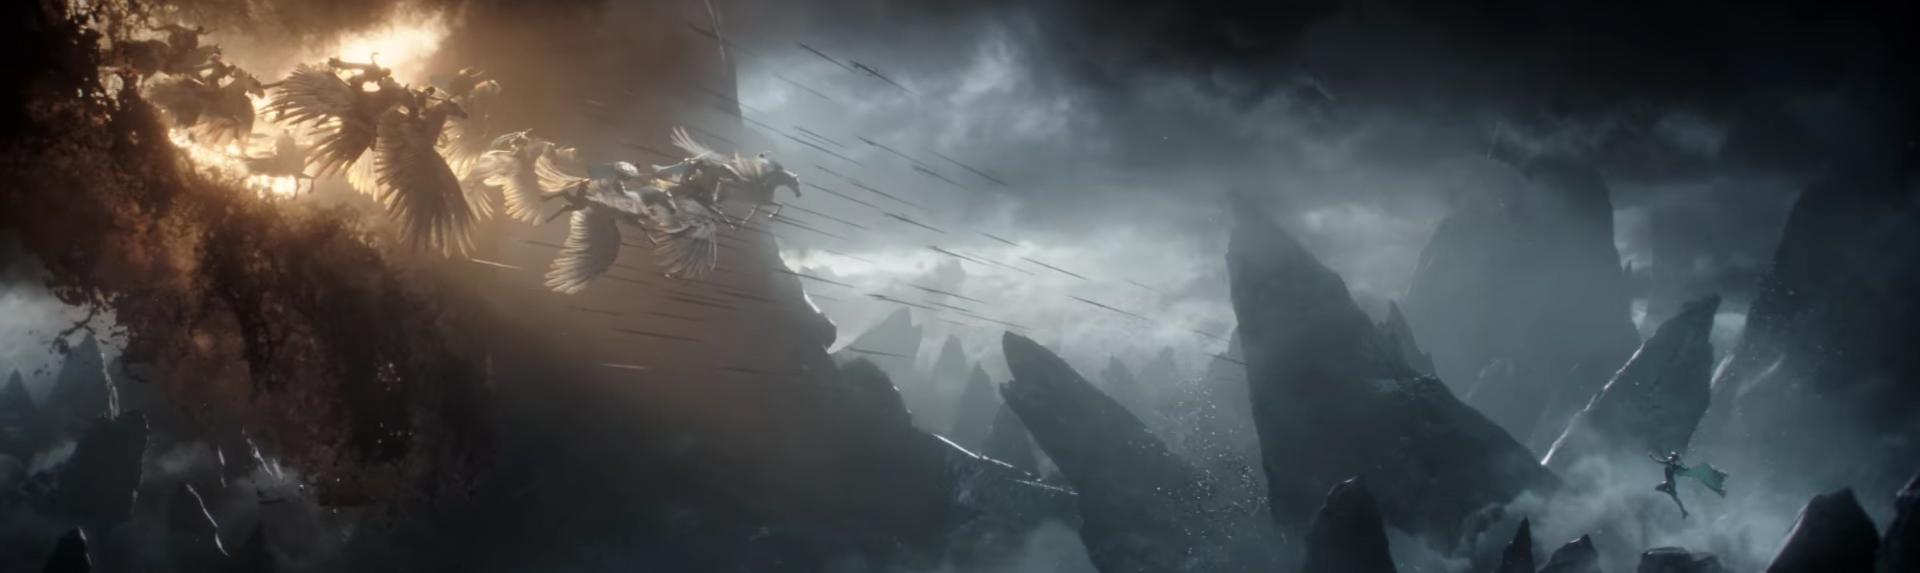 Thor: Ragnarok. Image Credit: Marvel/Disney